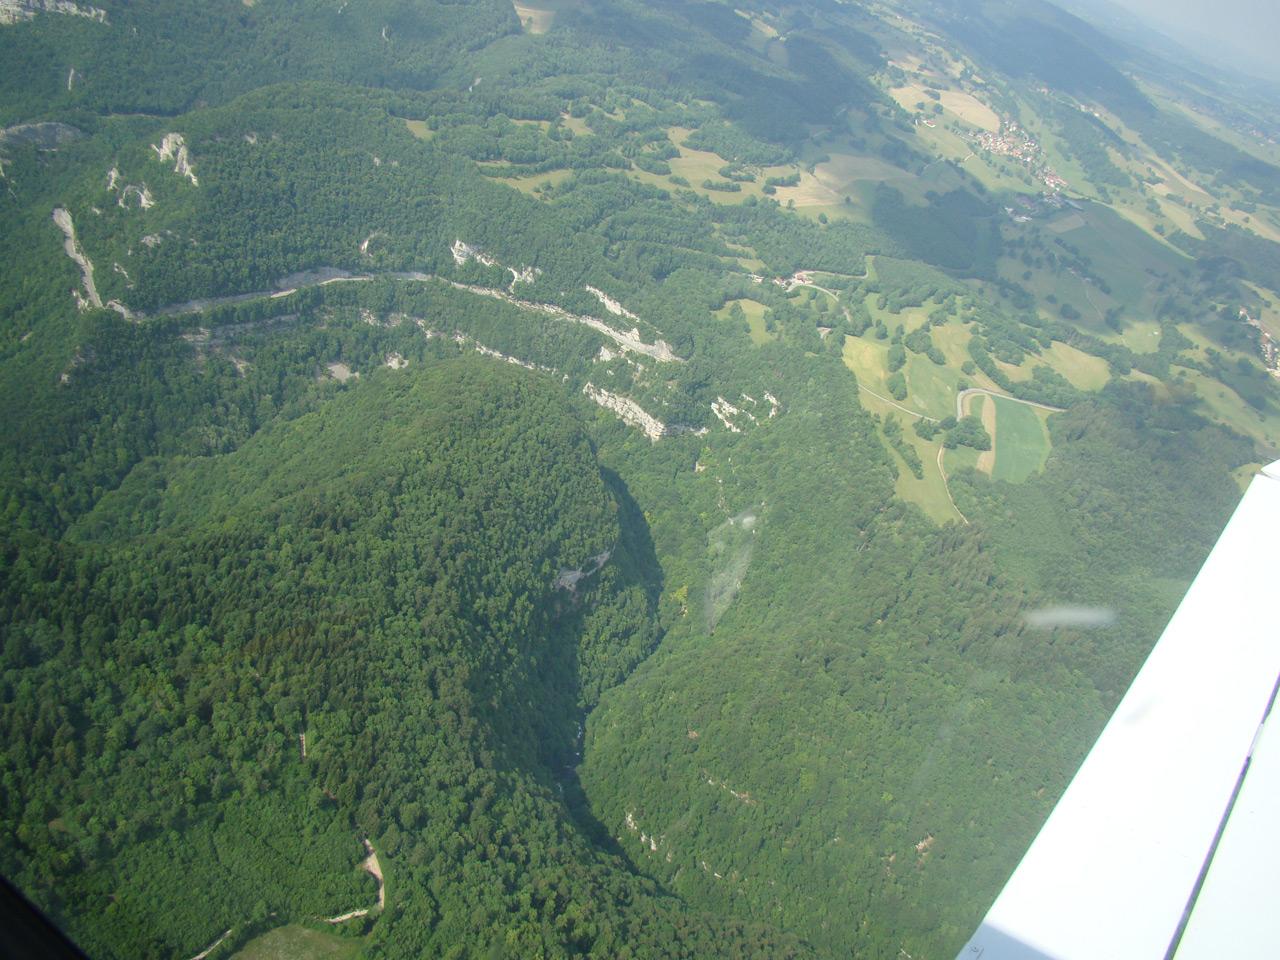 La vallée d'Ornans